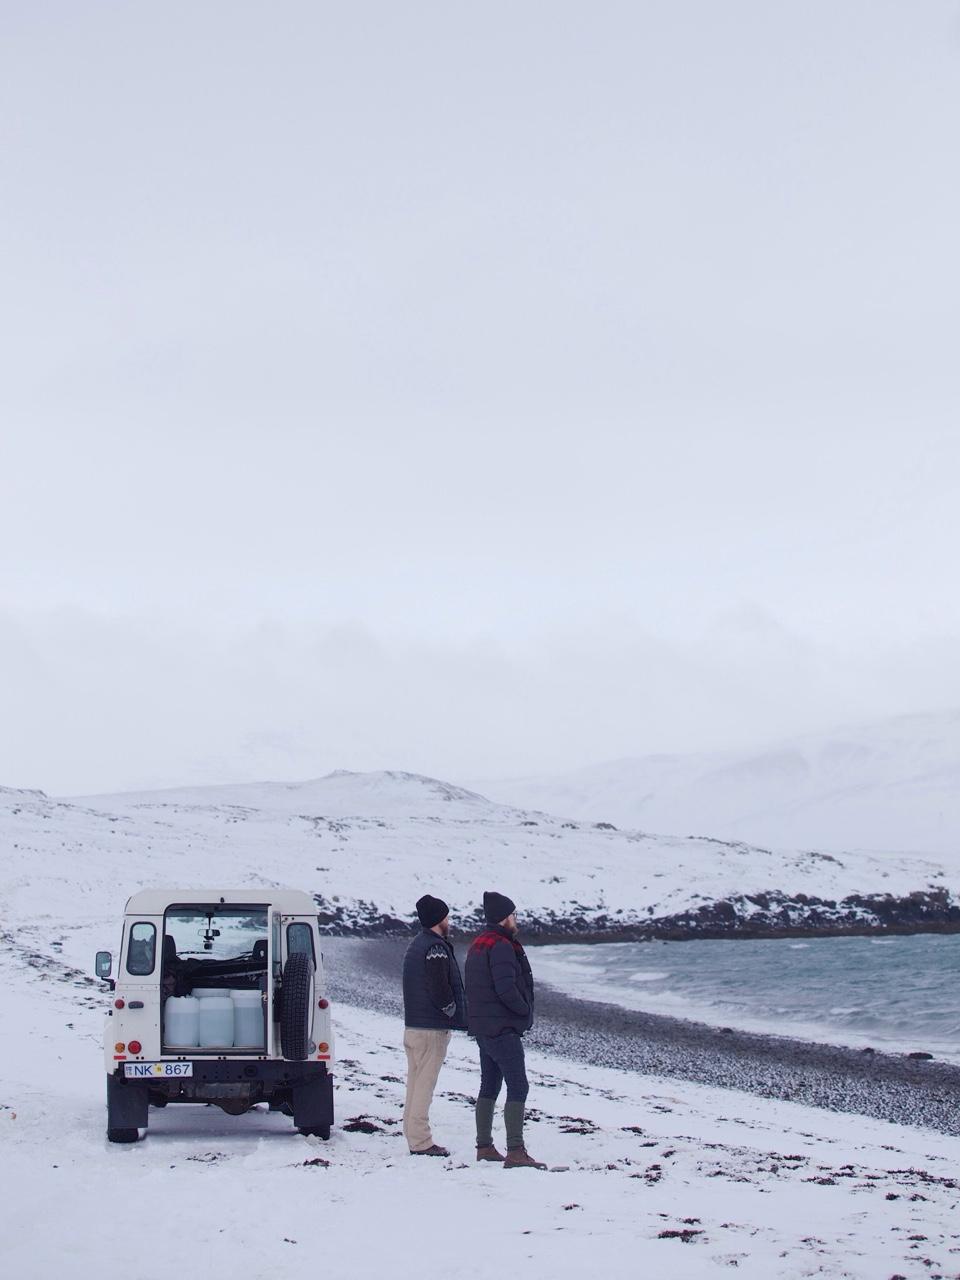 mono1984: Catching sea salt with chefs Gunnar Karl Gíslason & Ólafur Ágústsson